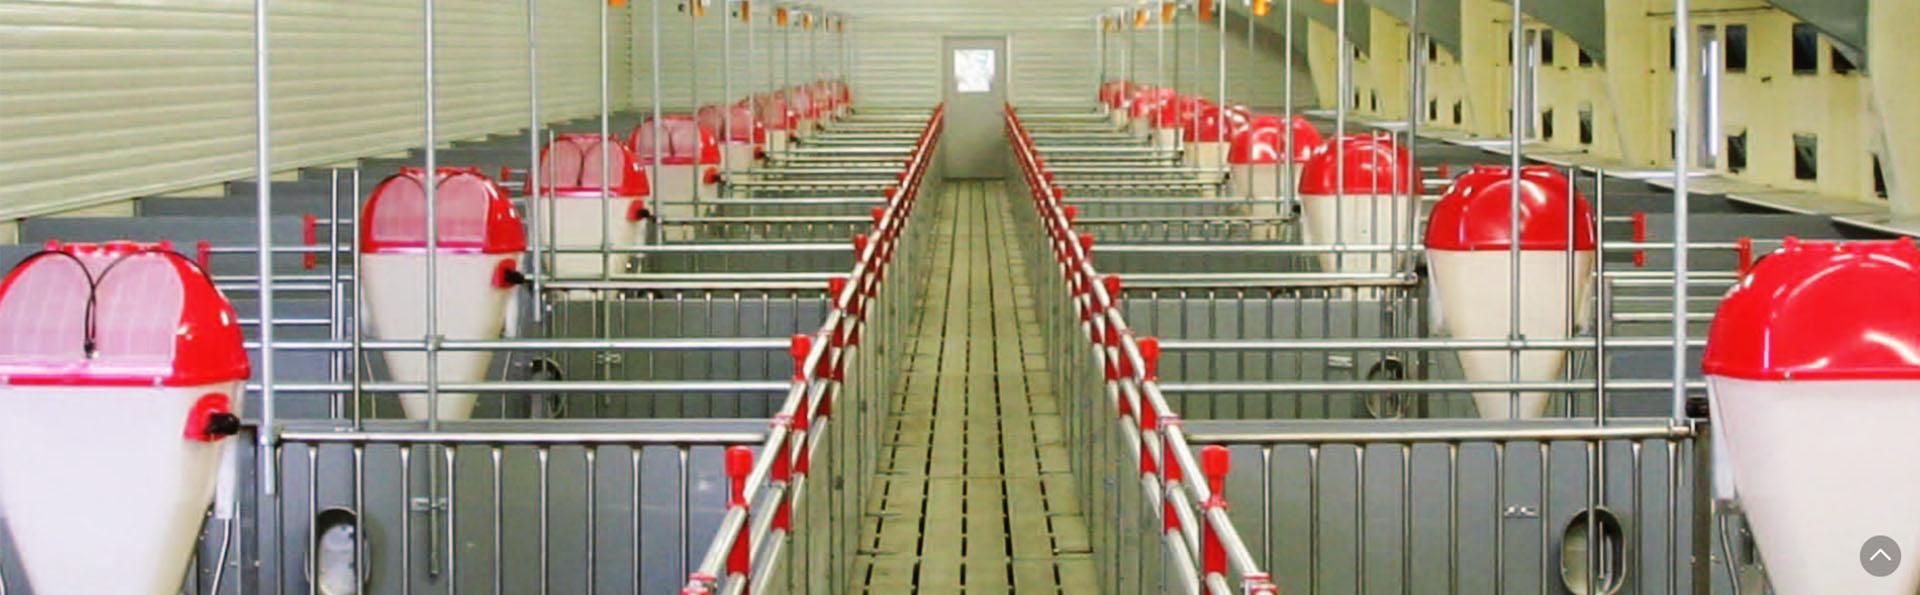 livestock equipment